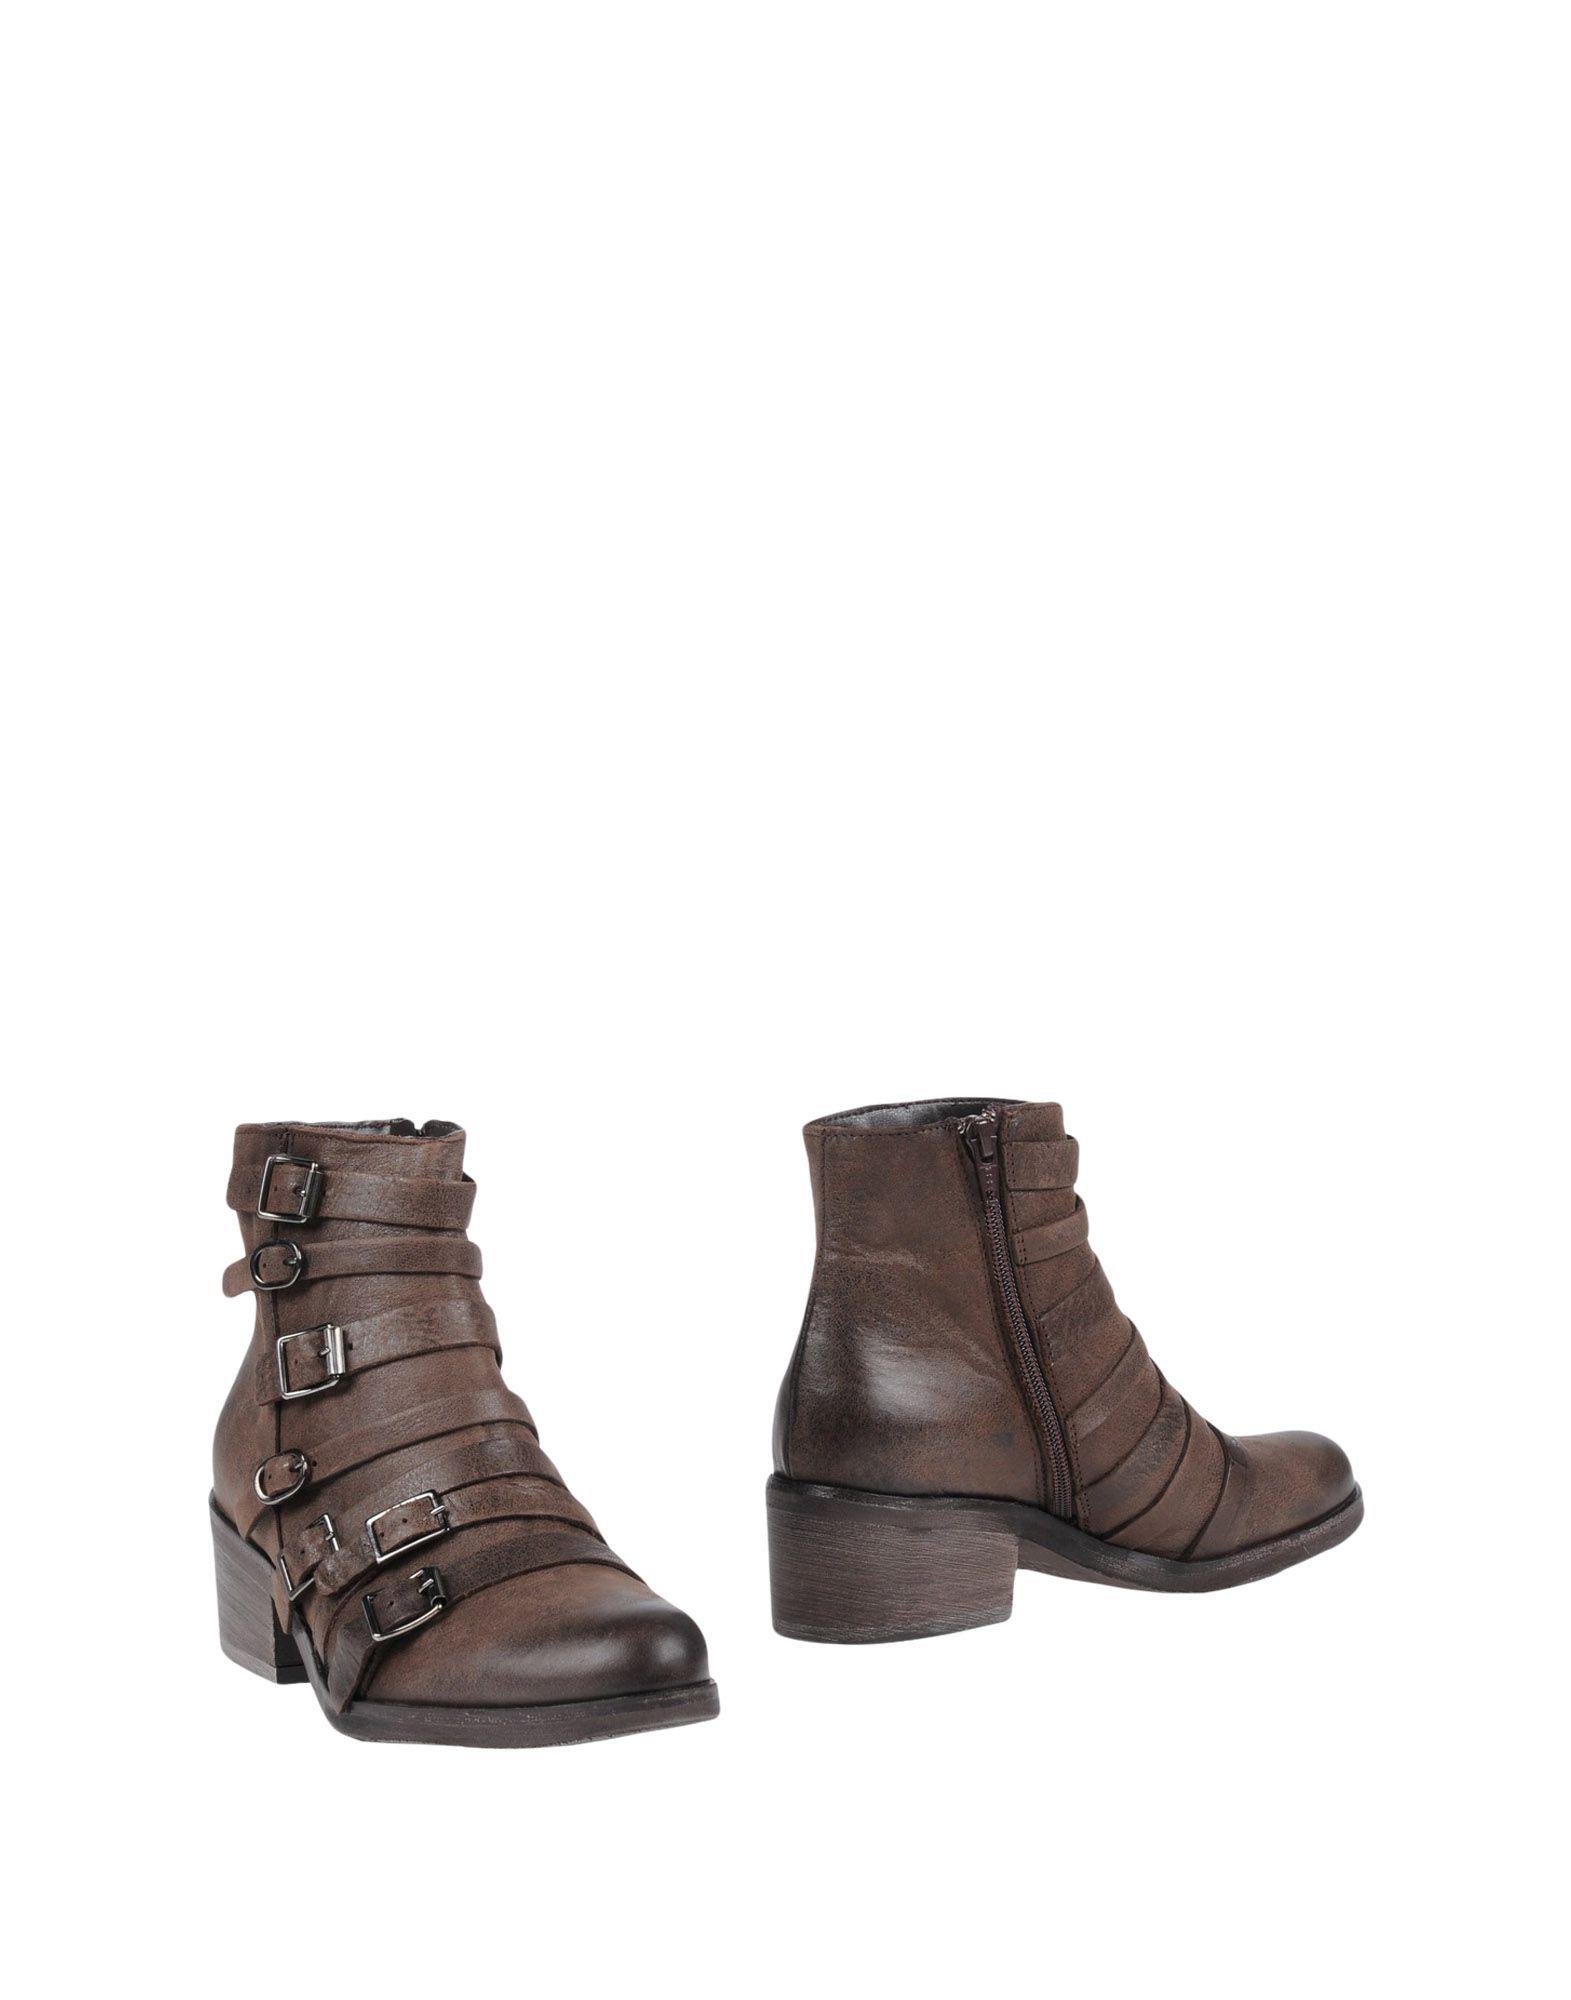 Paola Firenze Stiefelette Damen  11455993PU Gute Qualität beliebte Schuhe